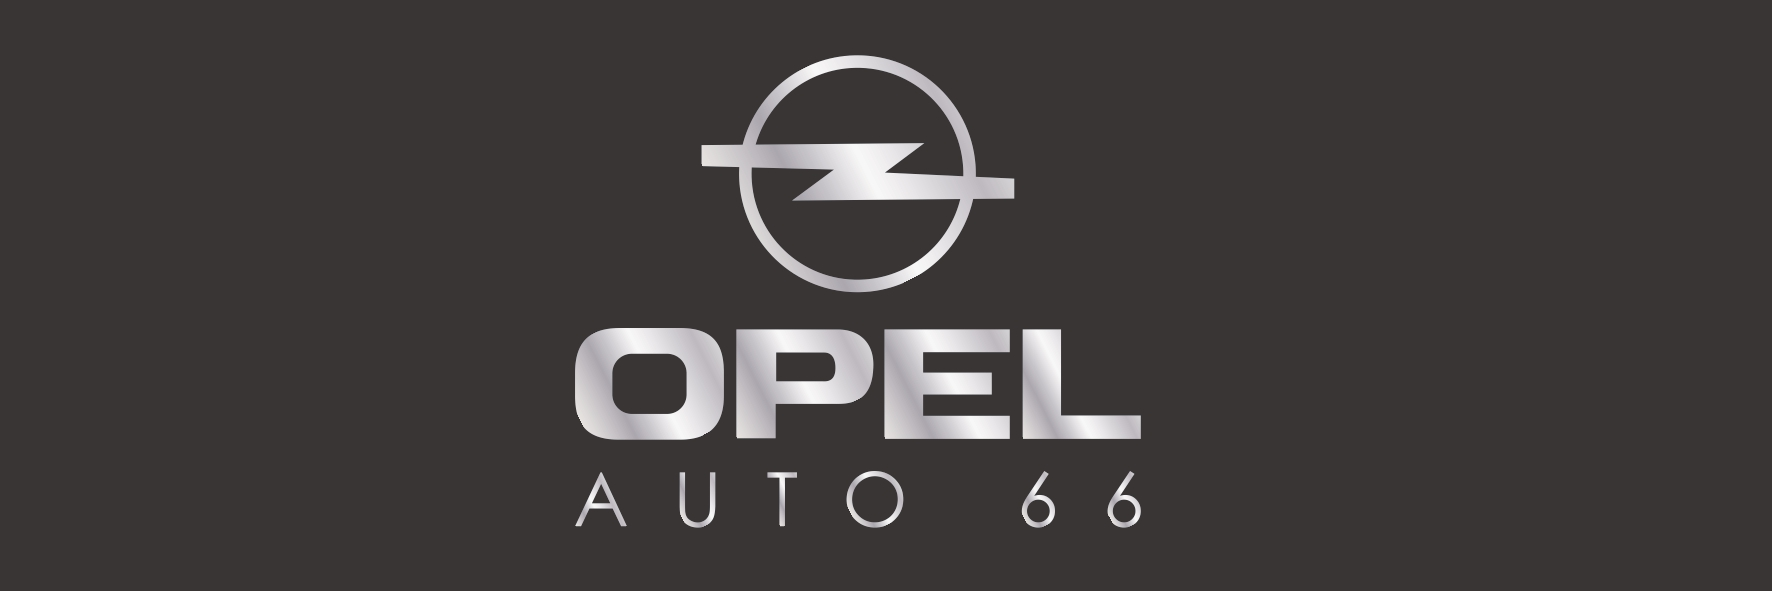 http://usepmm.fr/wp-content/uploads/2021/03/Opel-gris_page-0001.jpg